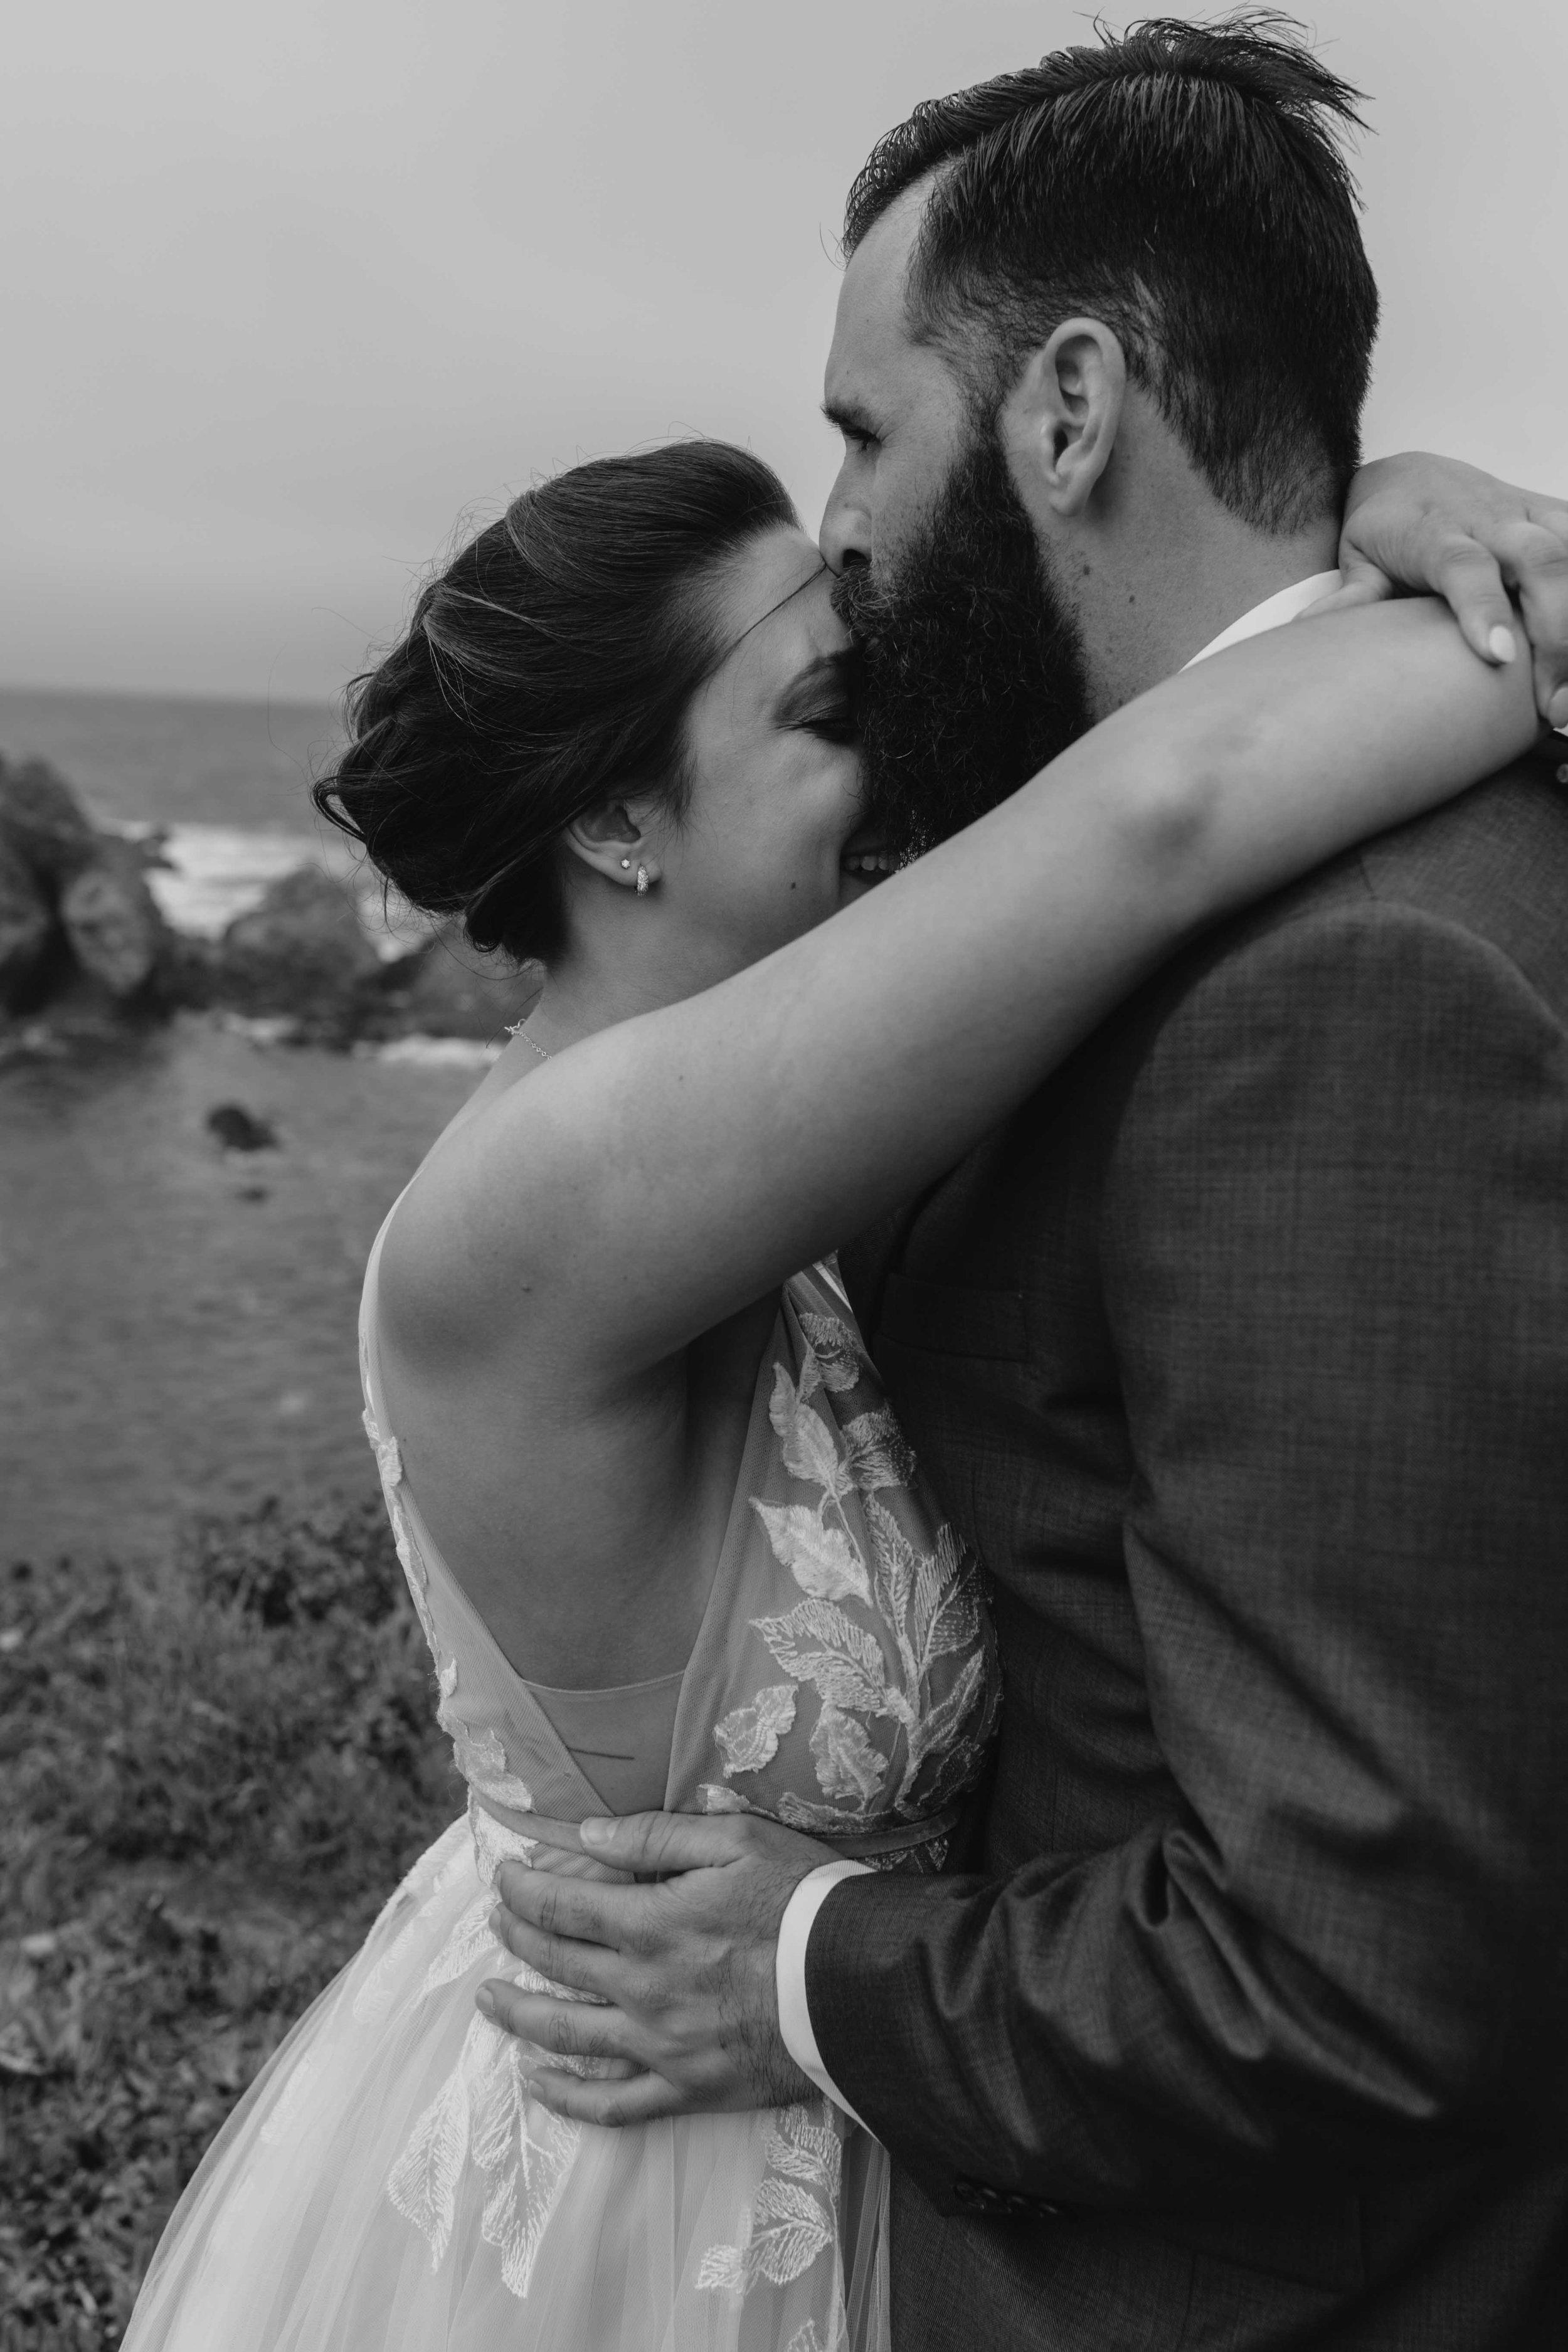 happy couple spokane bride and groom